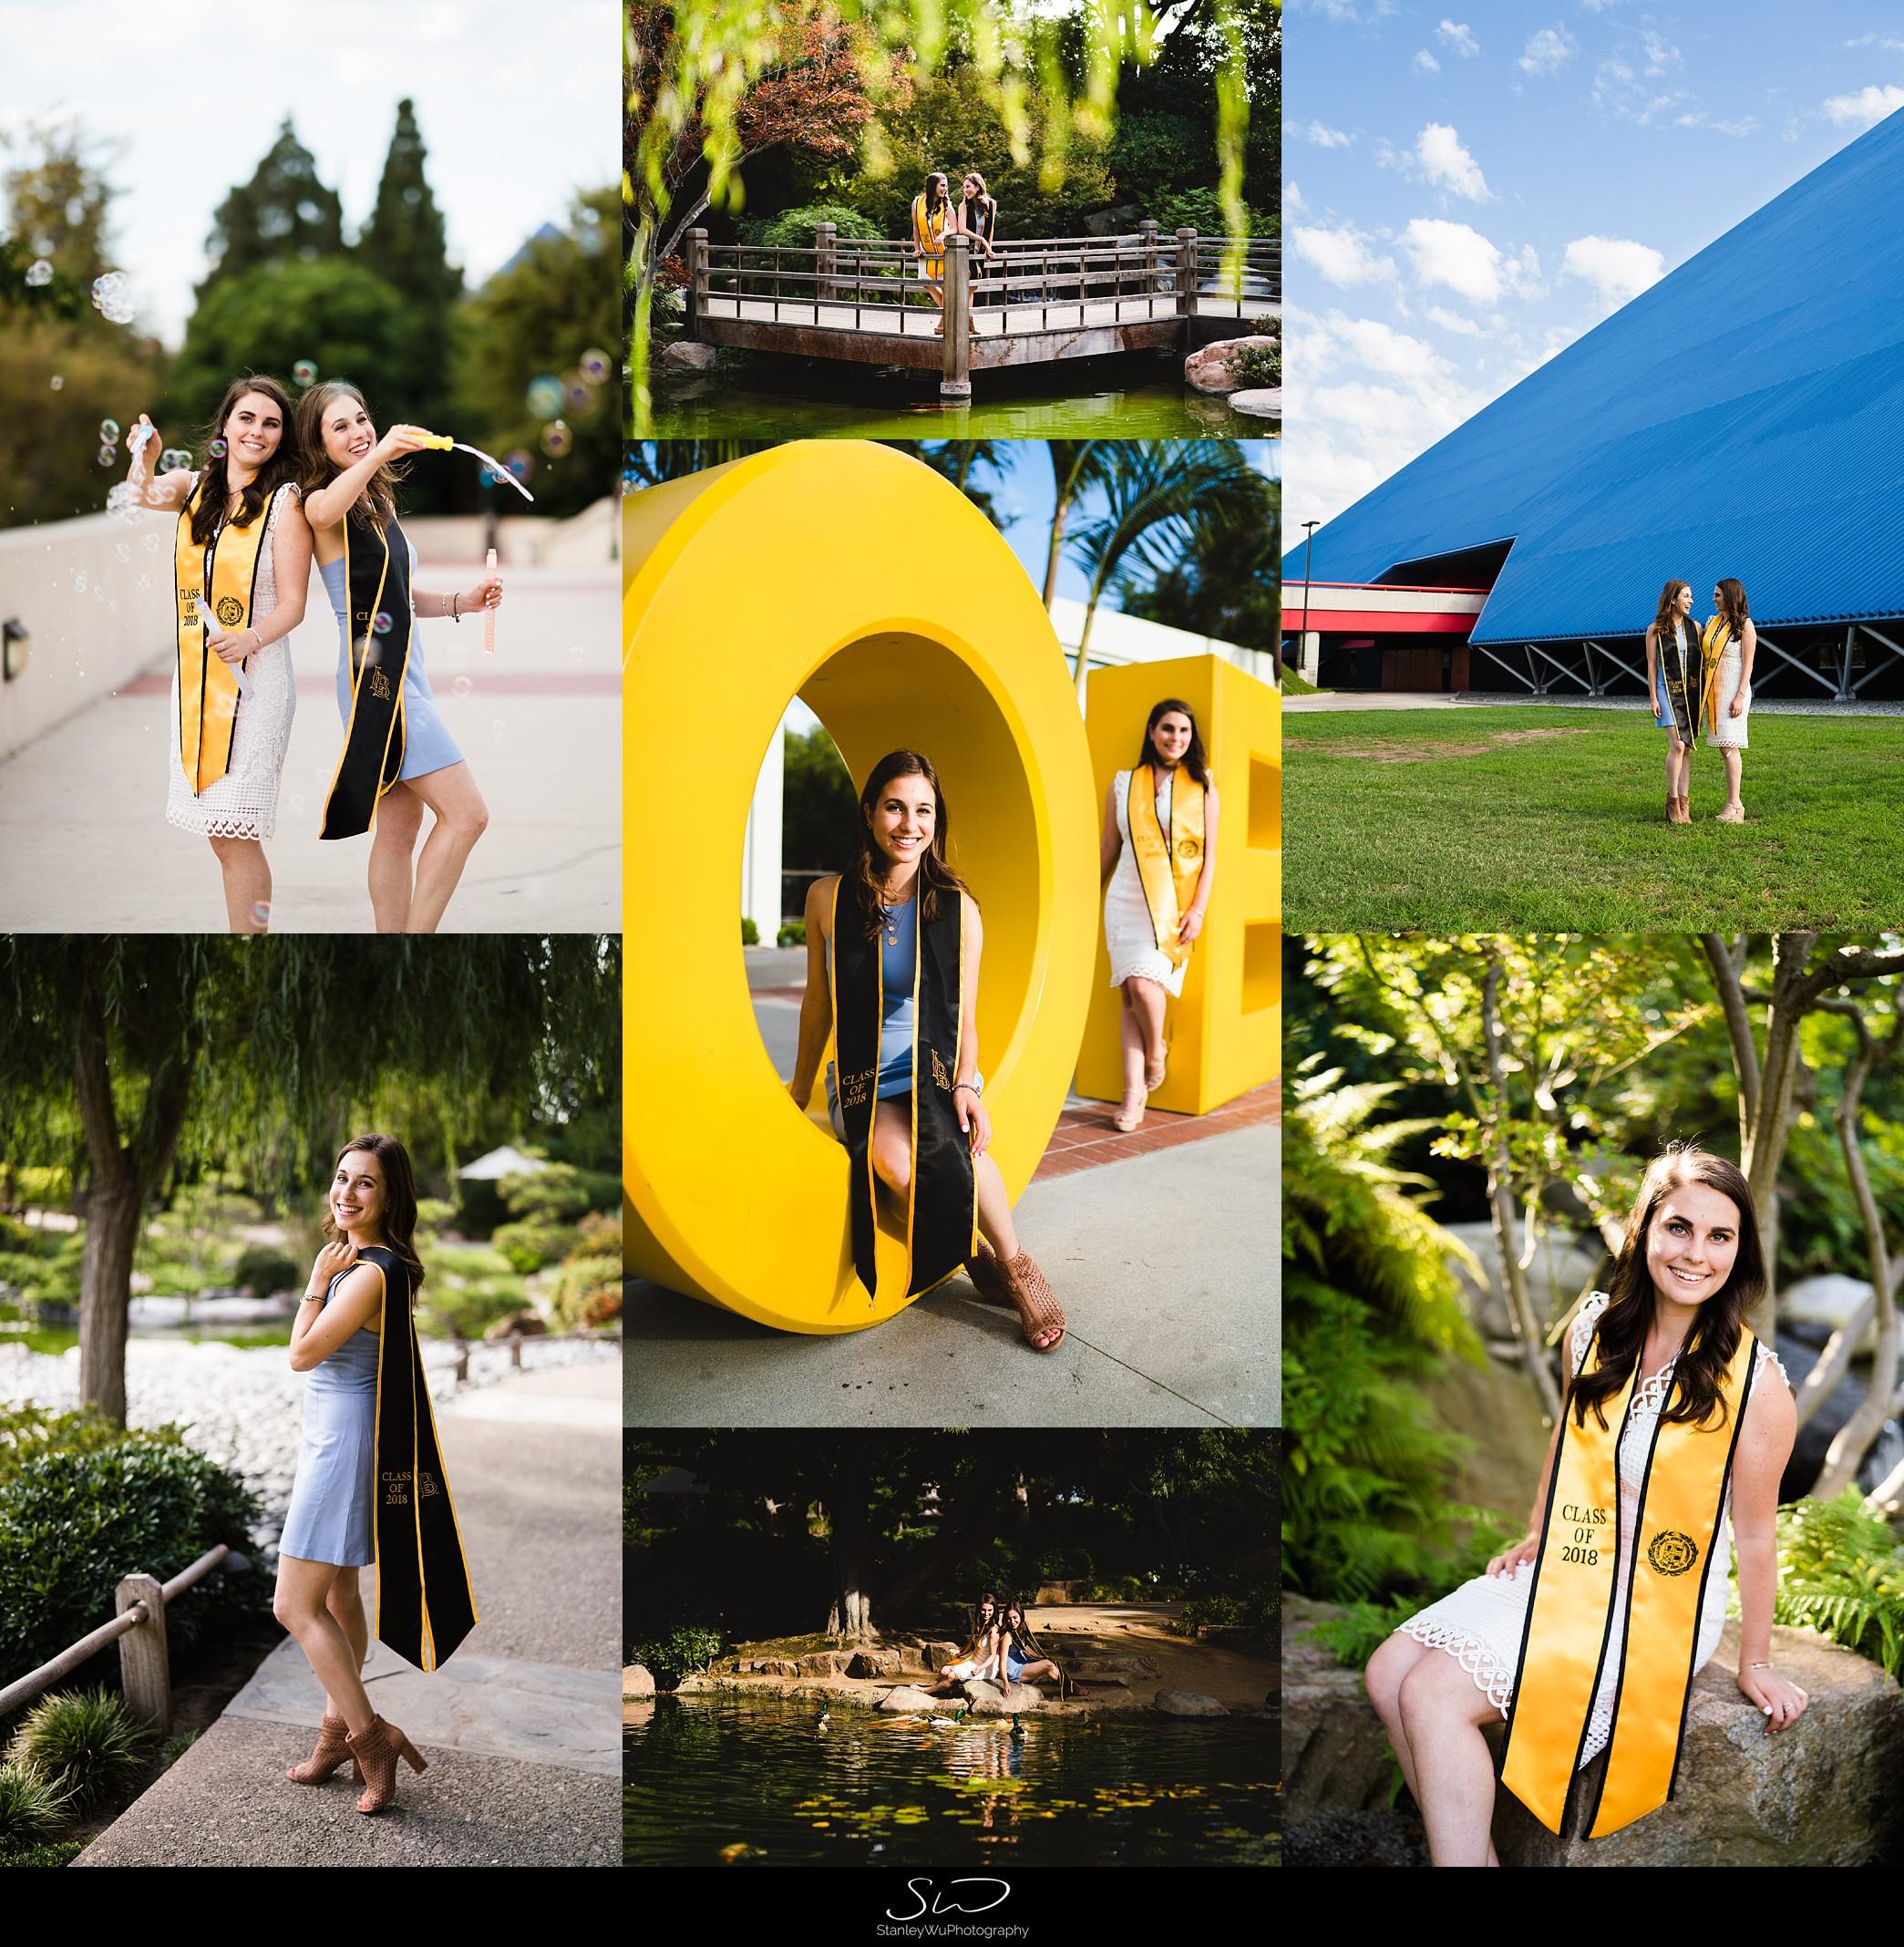 CSULB-csu-long-beach-graduation-senior-twin-portraits_0053.jpg